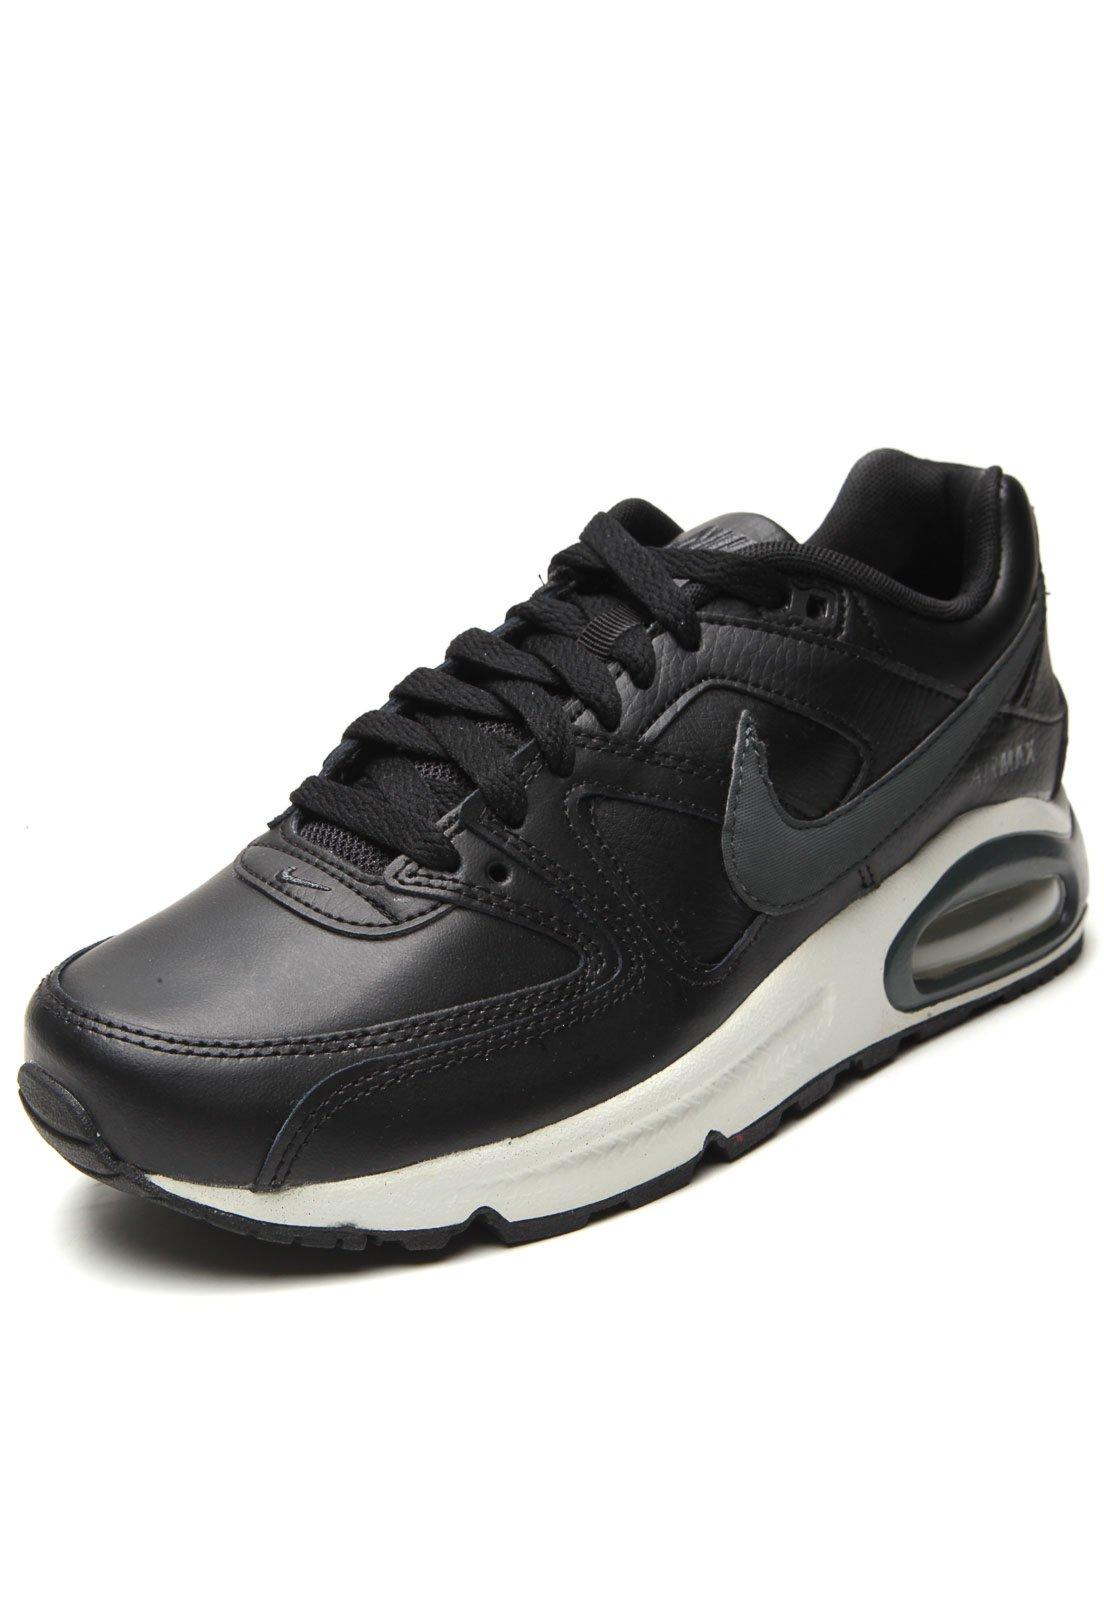 Tênis Nike Sportswear Air Max Command Leather Preto